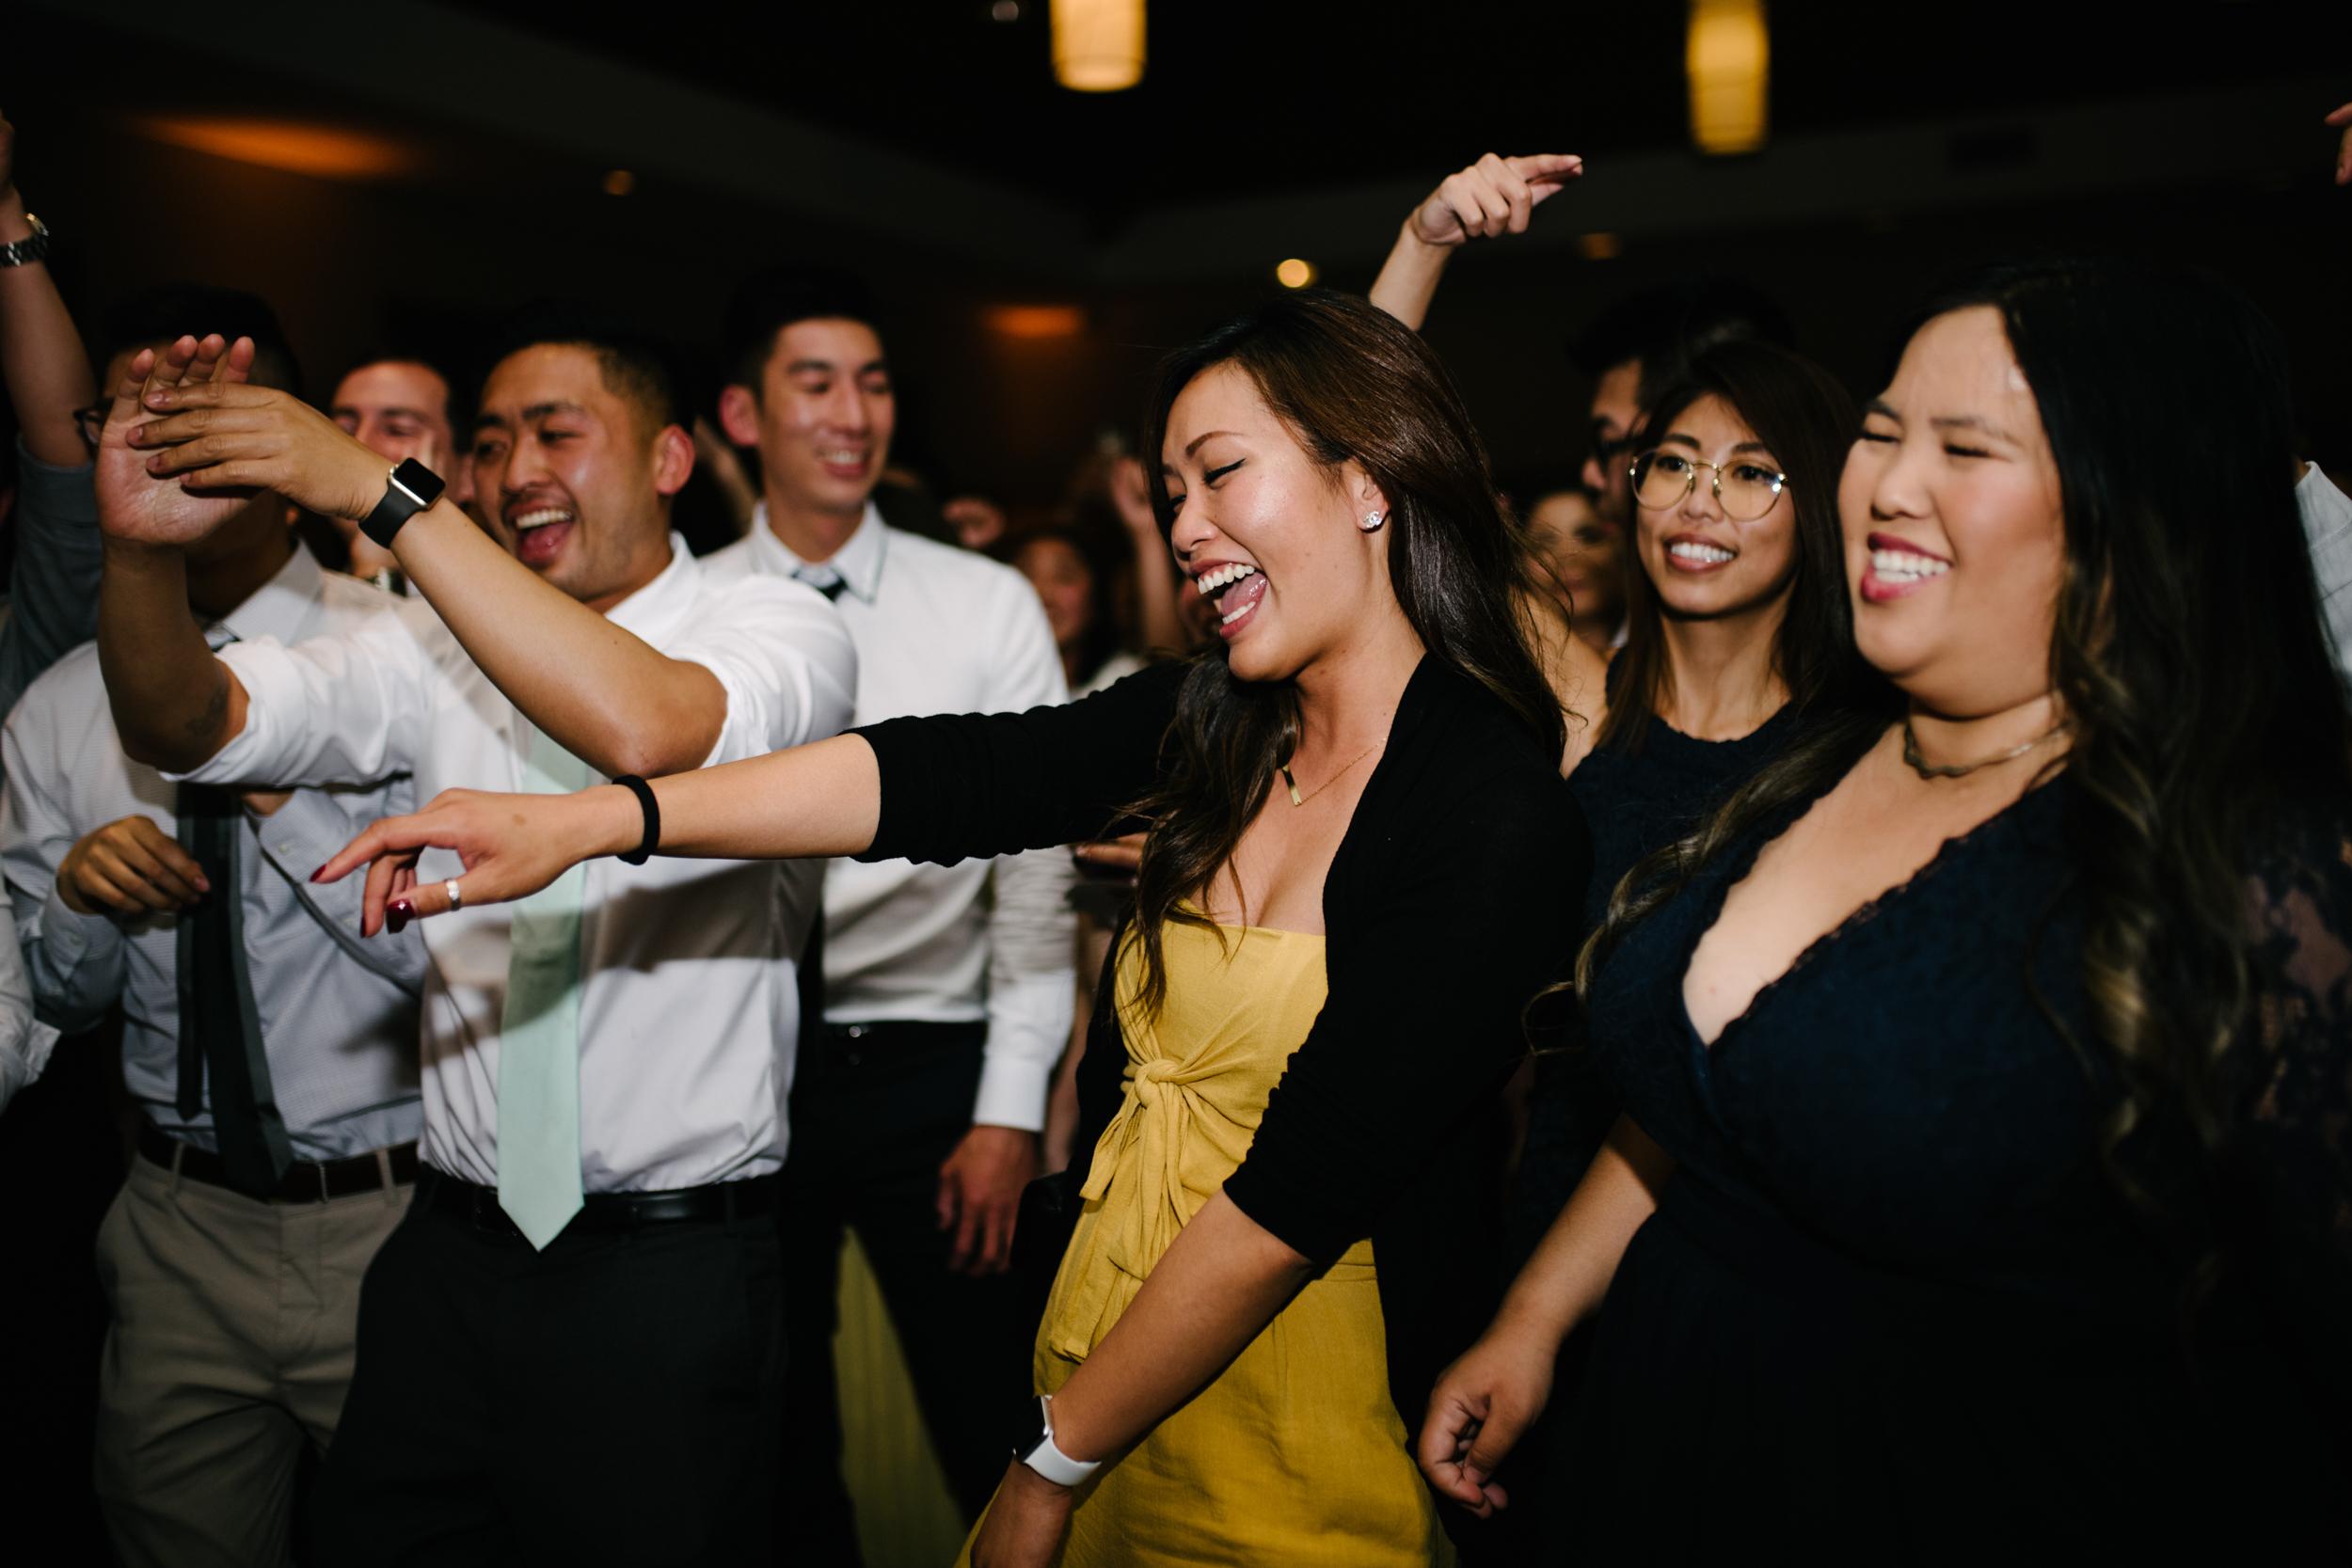 wedding_coronado_community_center-43.jpg